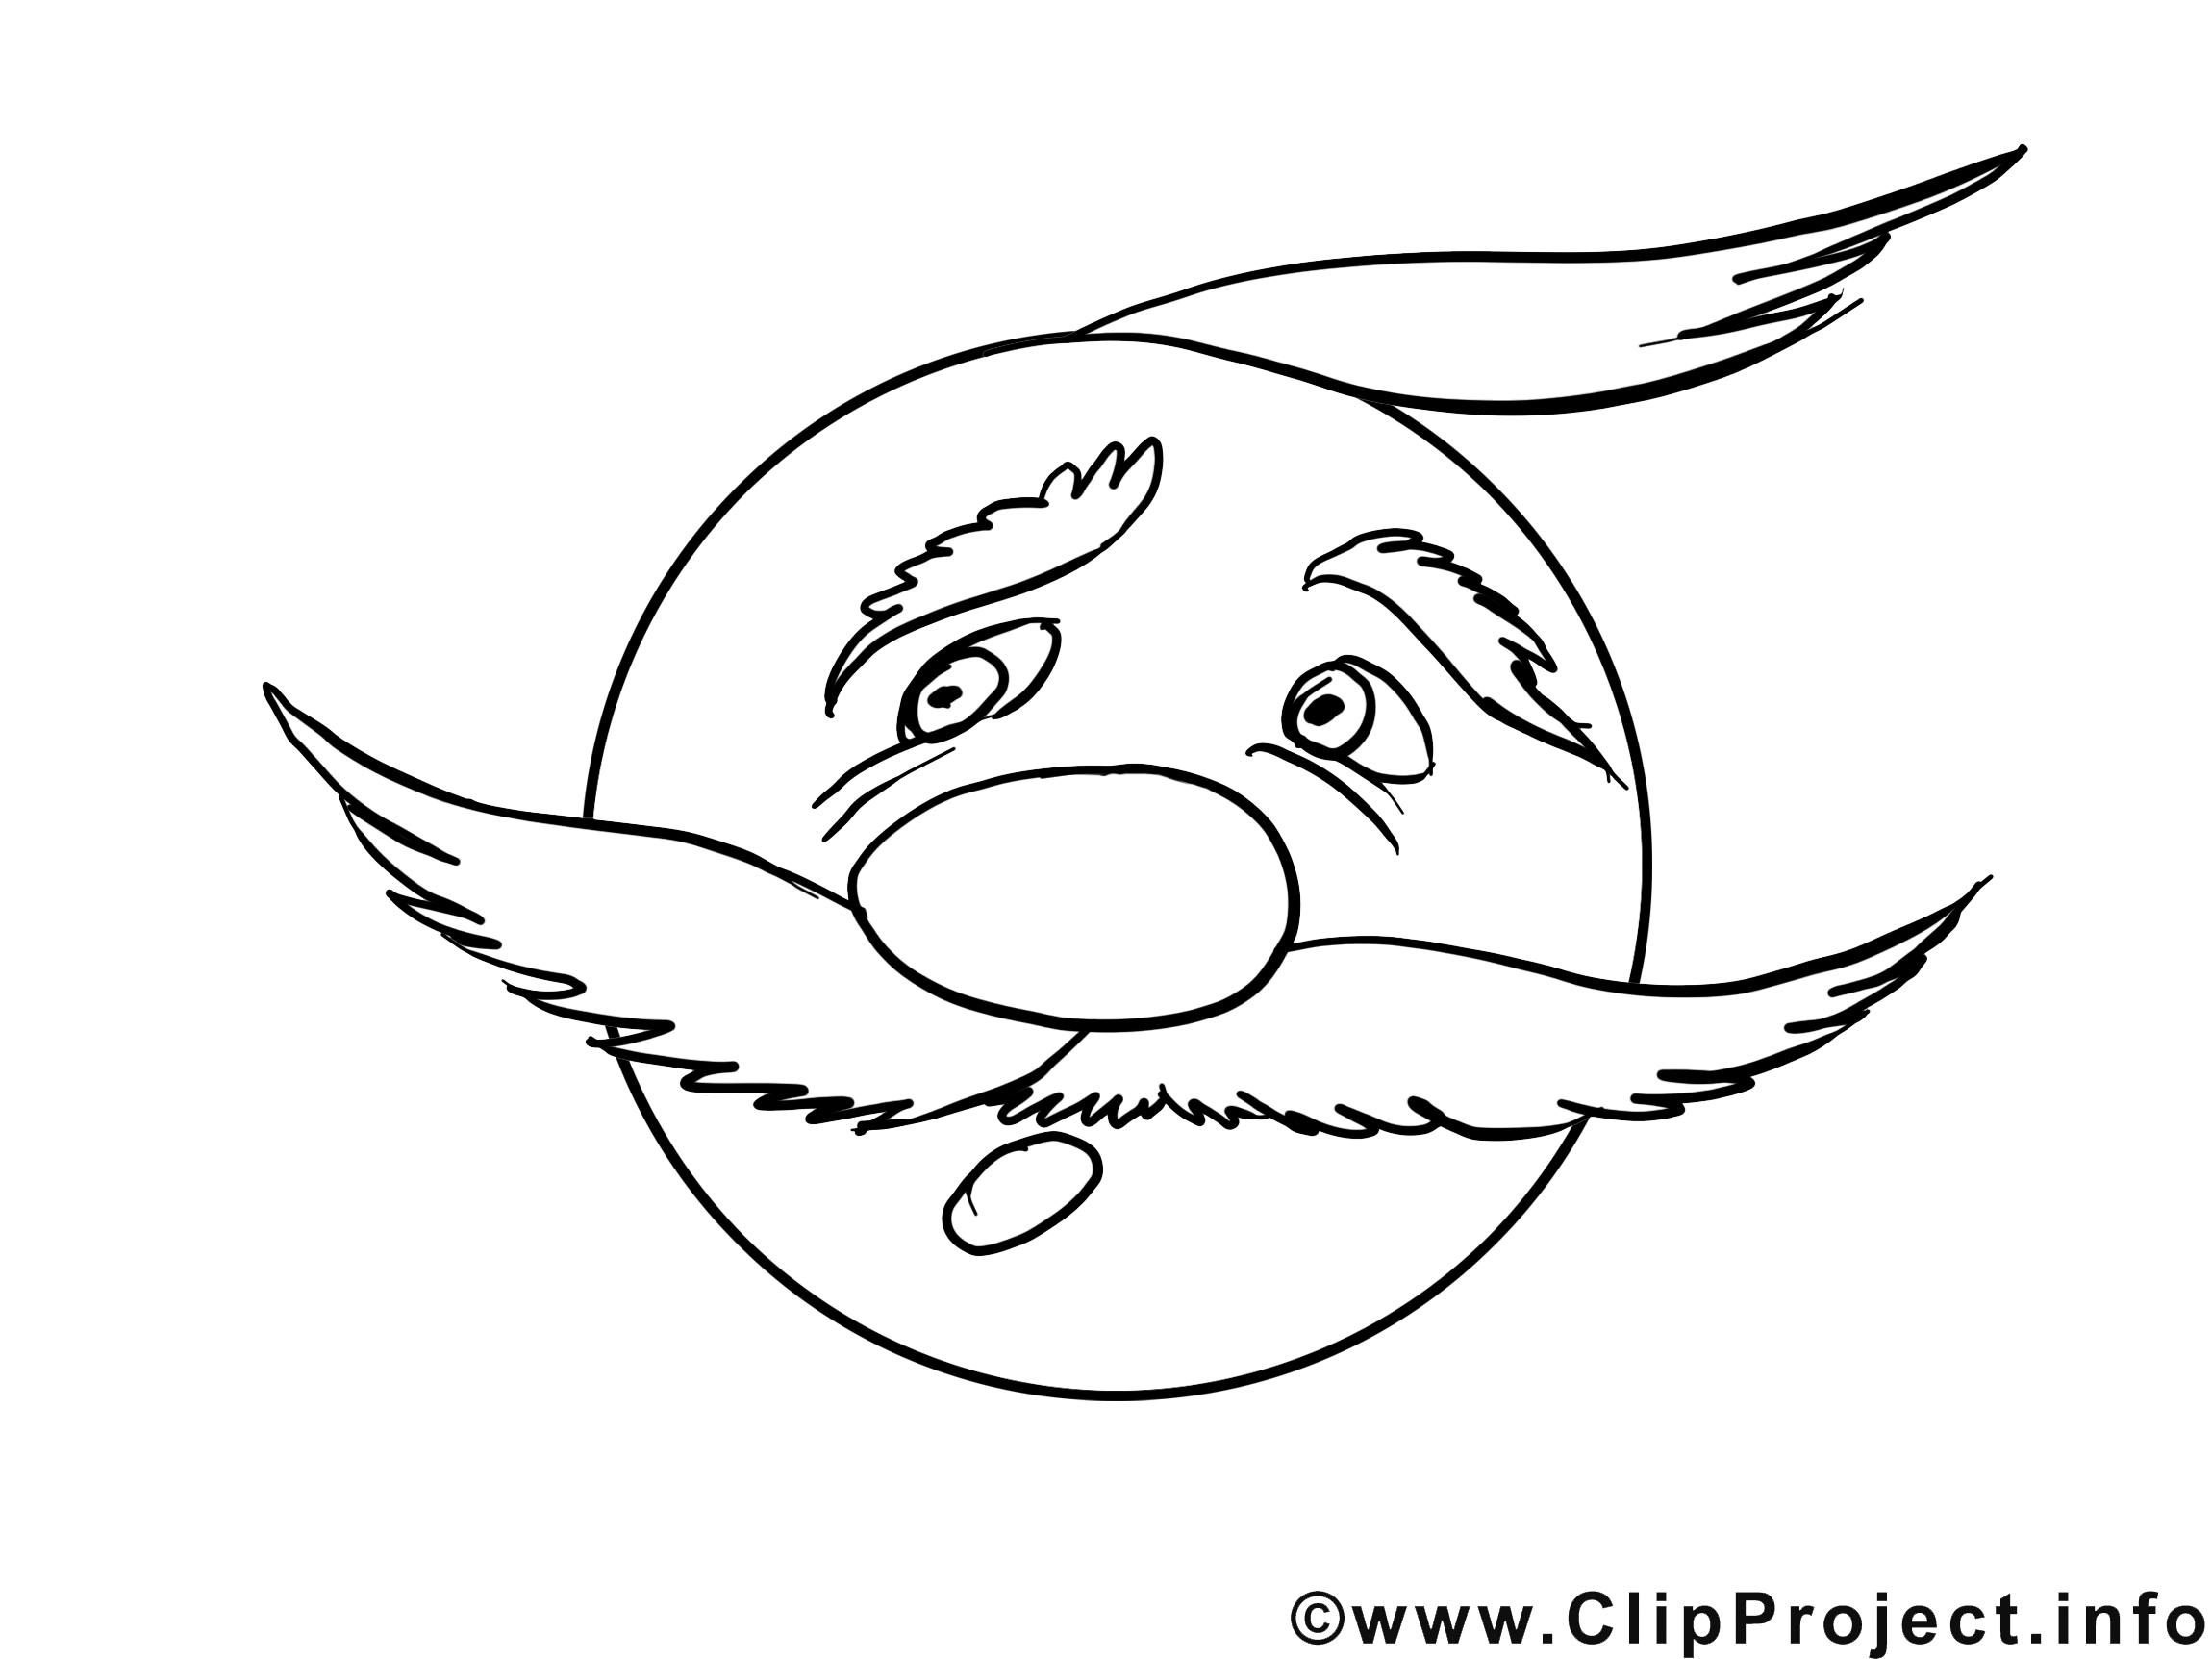 Effrayé dessin – Émoticônes gratuits à imprimer